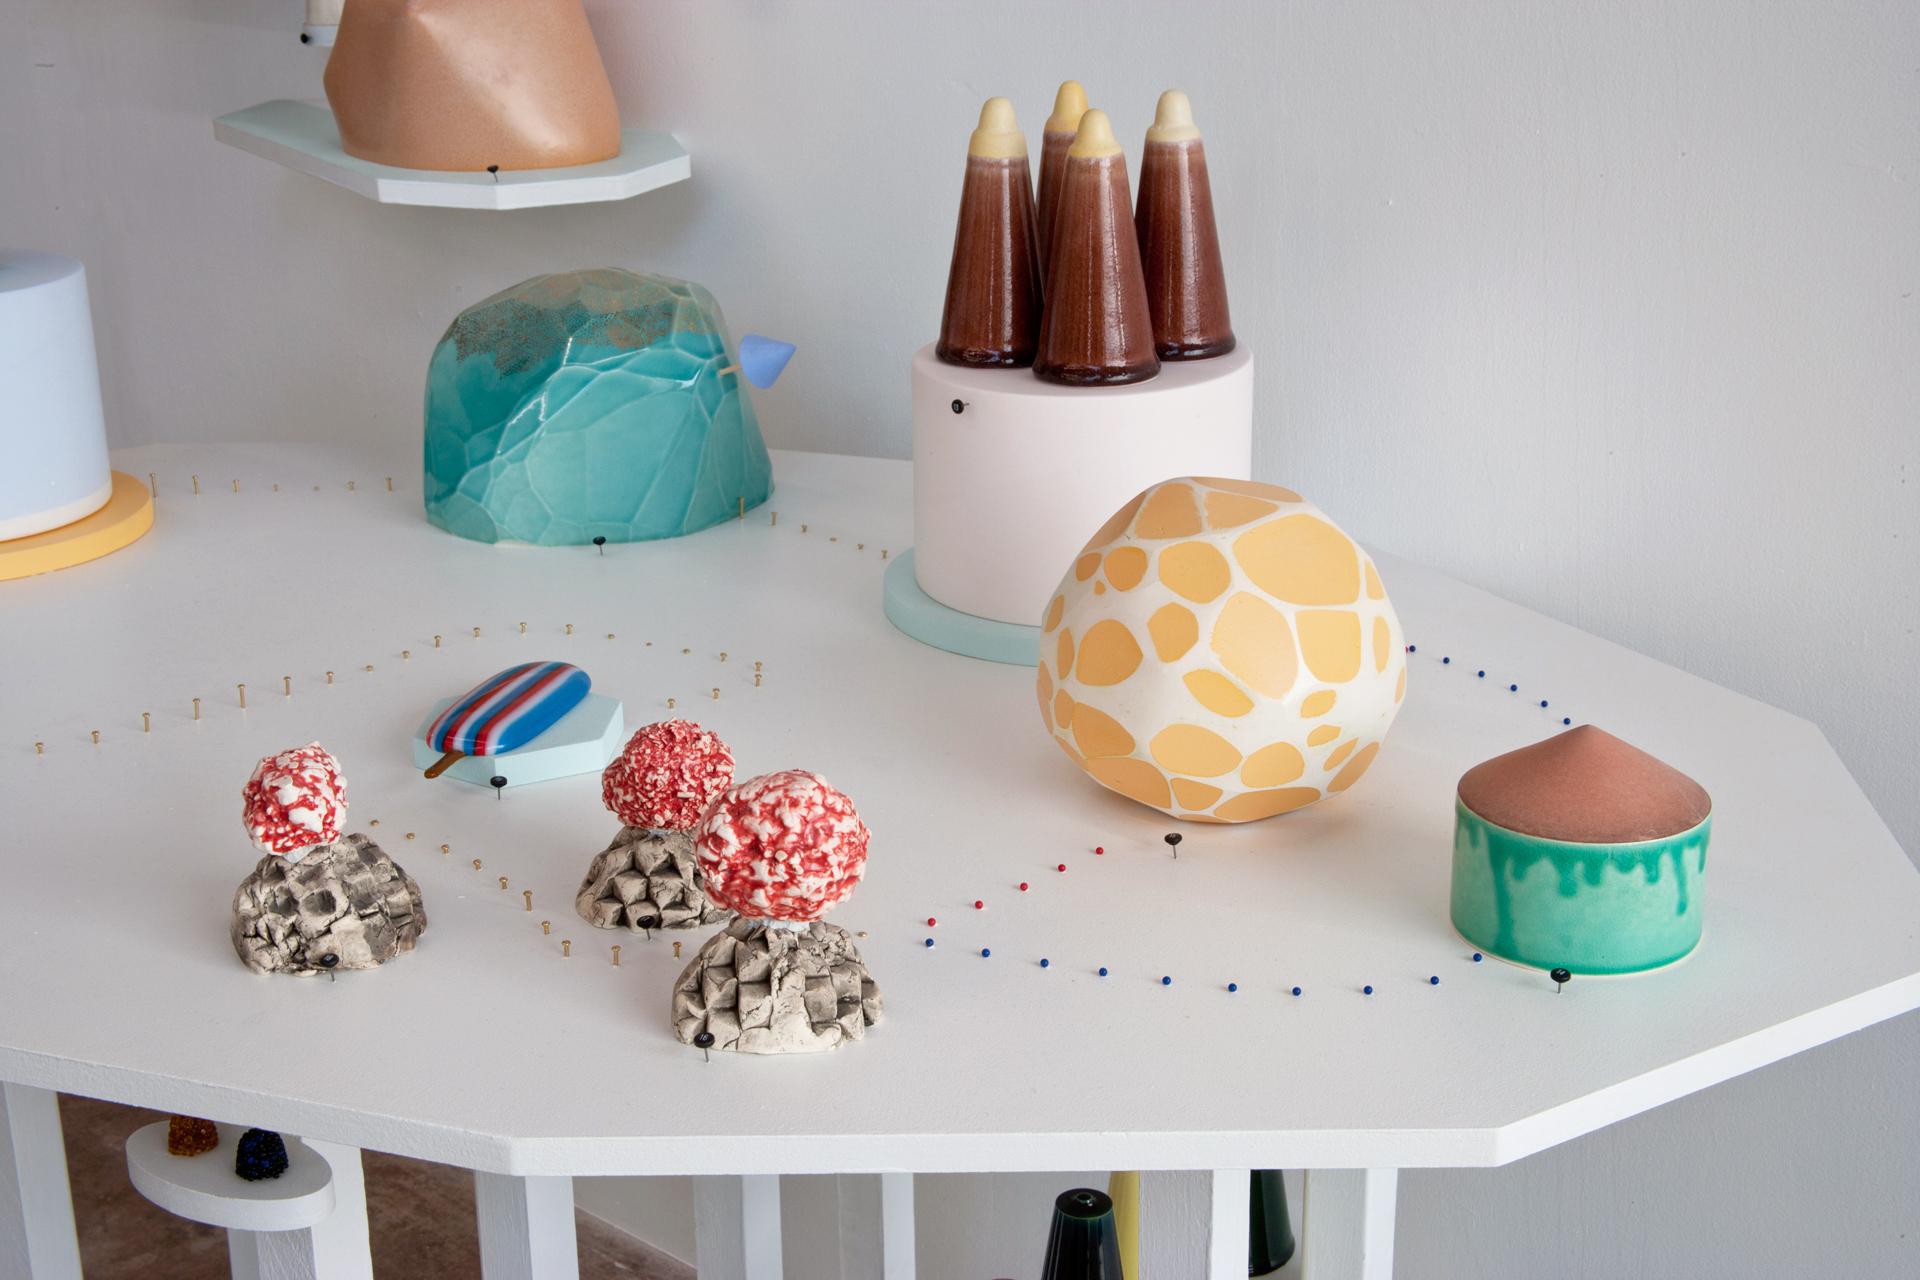 Sweetsscape  Porcelain, glass, plaster, stain, wood, MDF, paint, epoxy, pins 2011 Photo Credit: E.G. Schempf